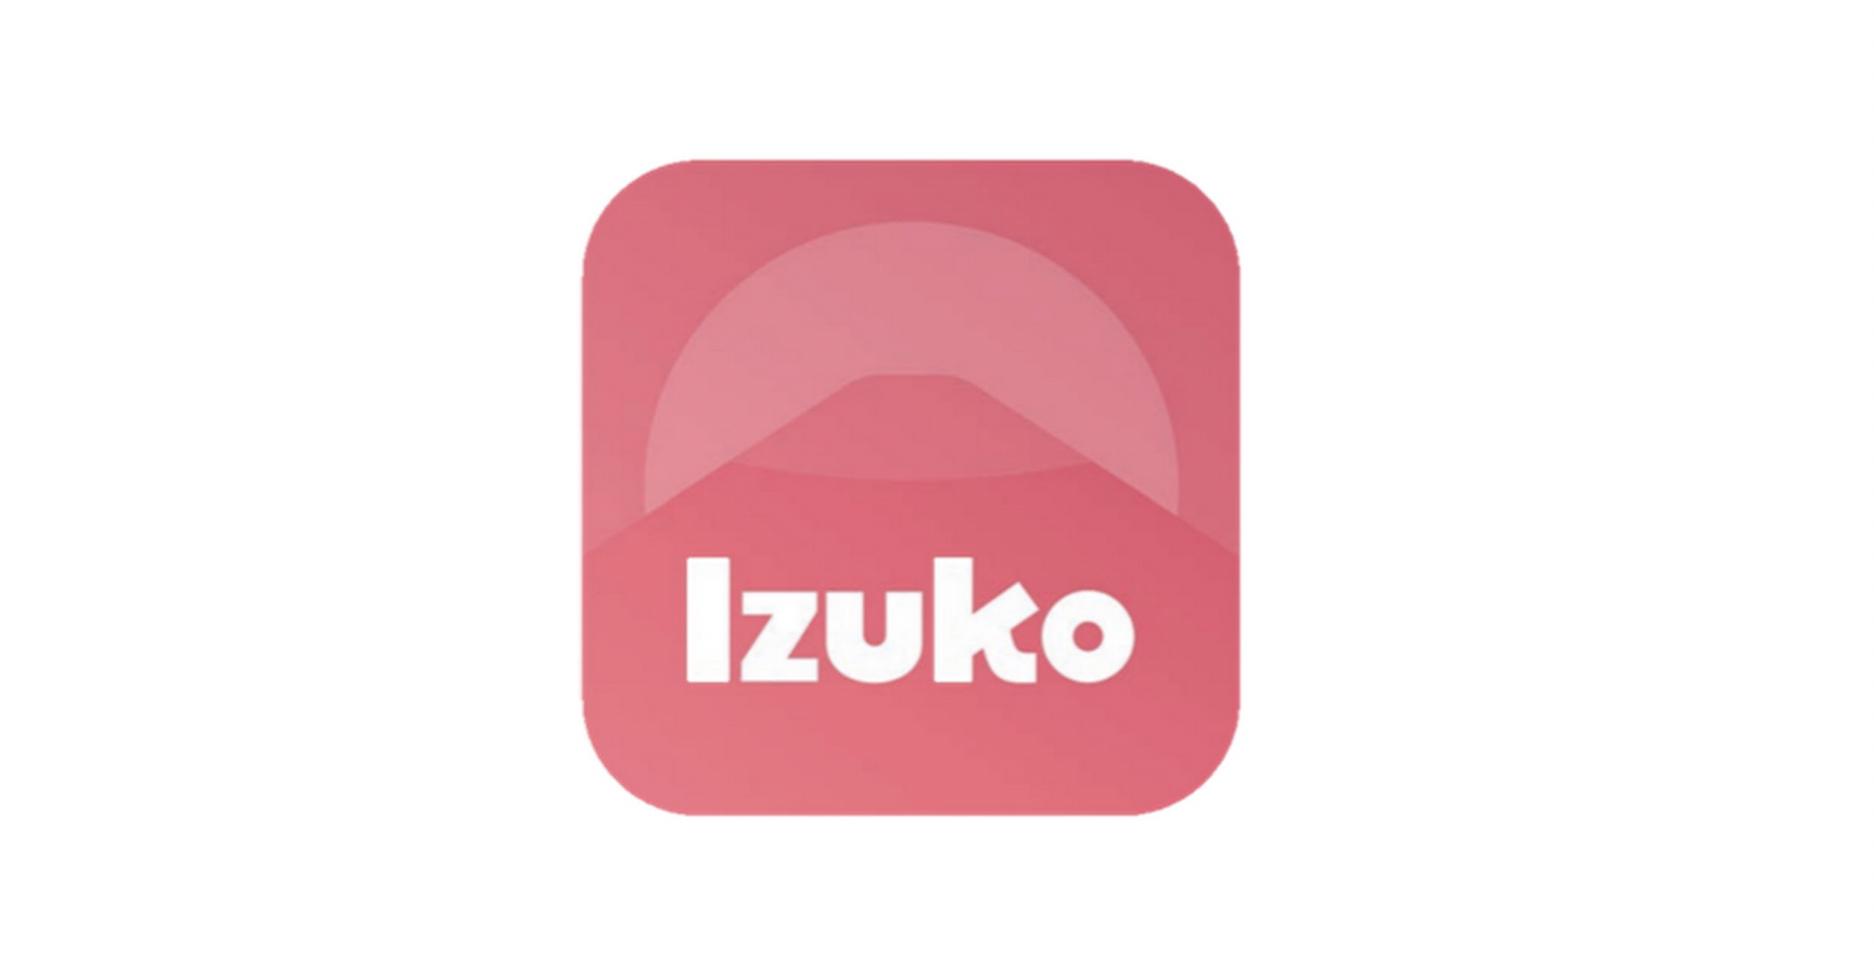 "【結果報告】 東急等が展開、「観光型MaaS""Izuko""」約190日の実証実験"